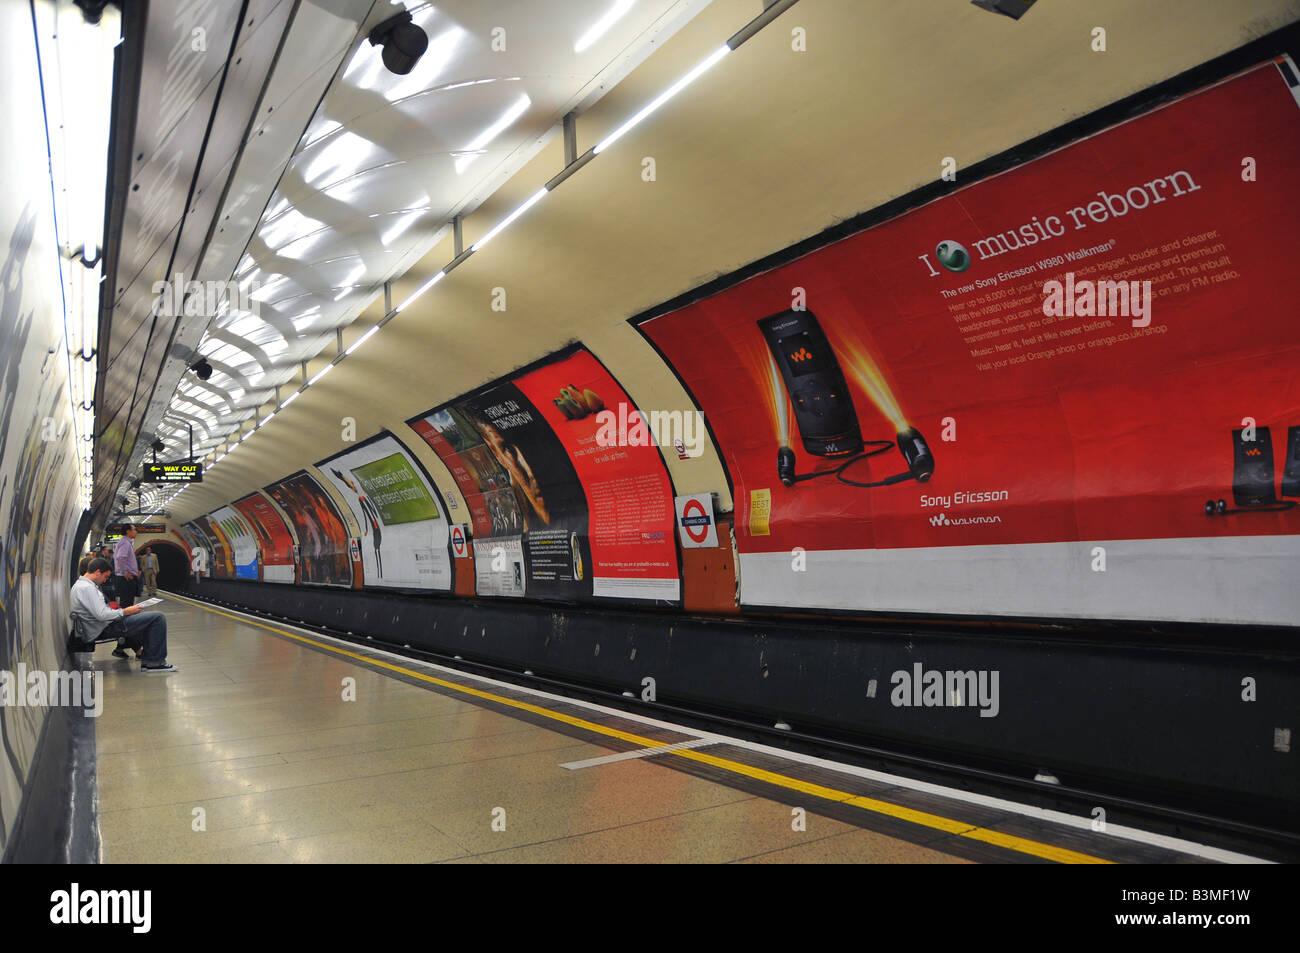 Charing Cross tube station, London, England - Stock Image